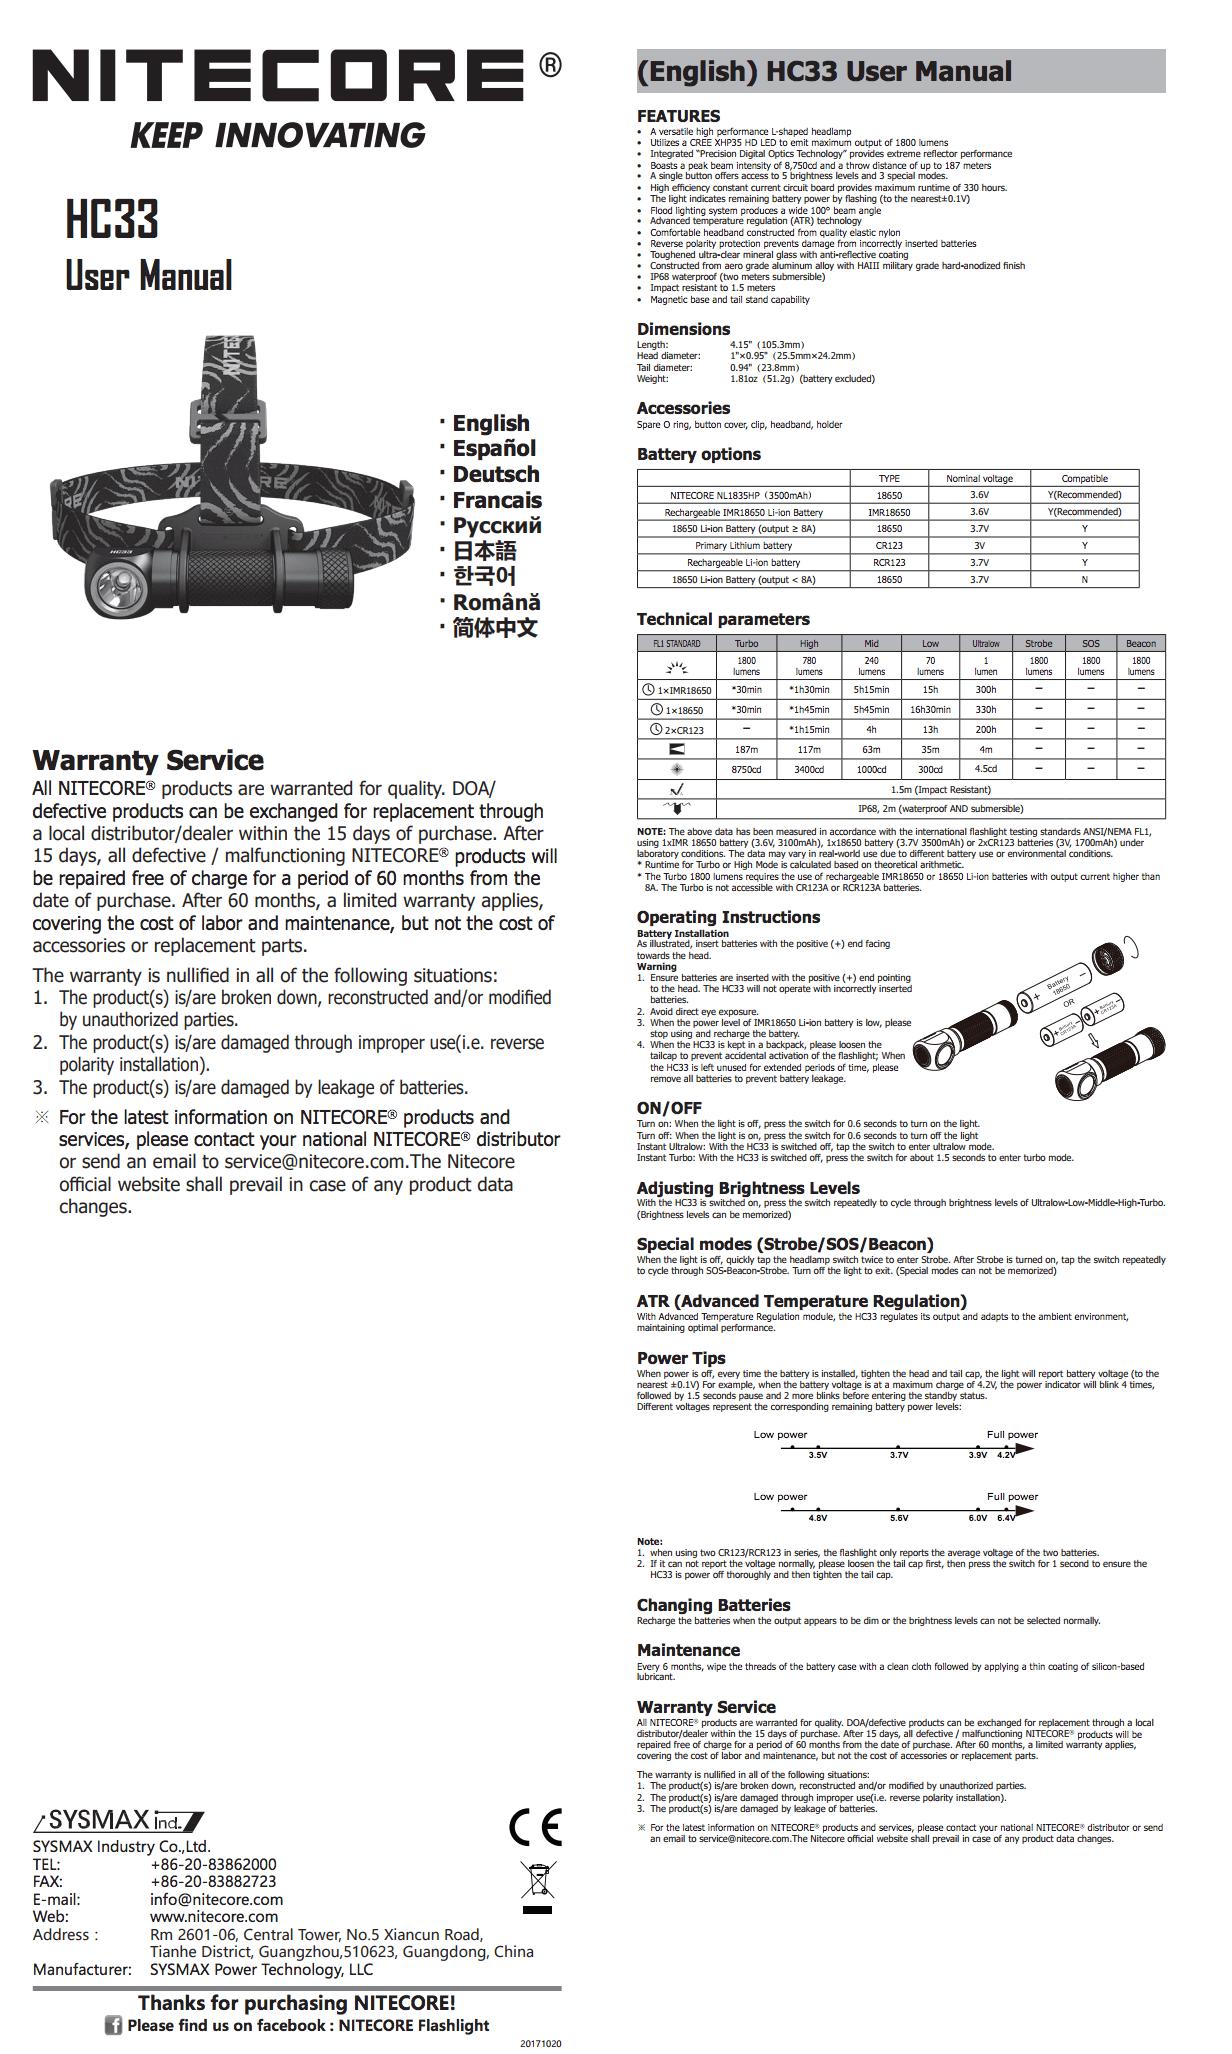 HC33_Manual.png